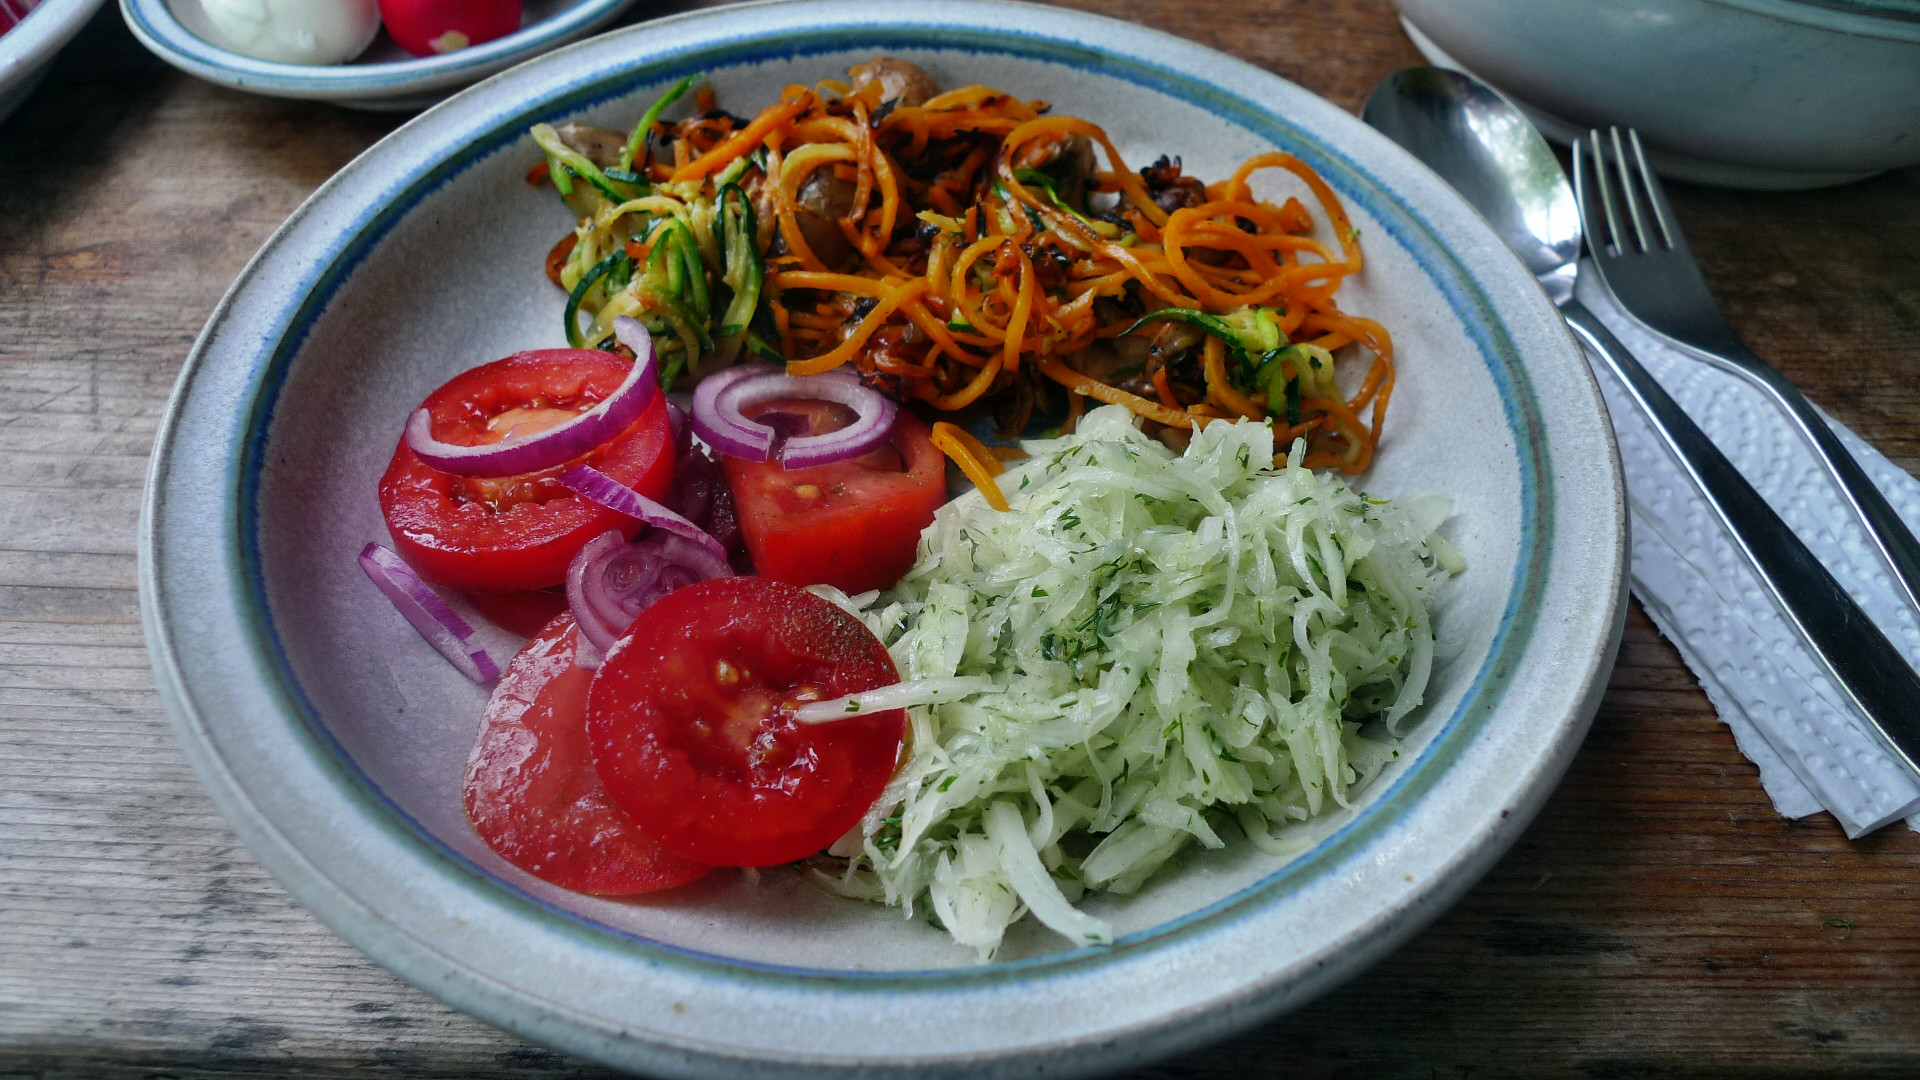 Gemüsespaghetti mit Champignon,Kohlrabisalat,Tomatensalat,vegan -5.5.15   (13)